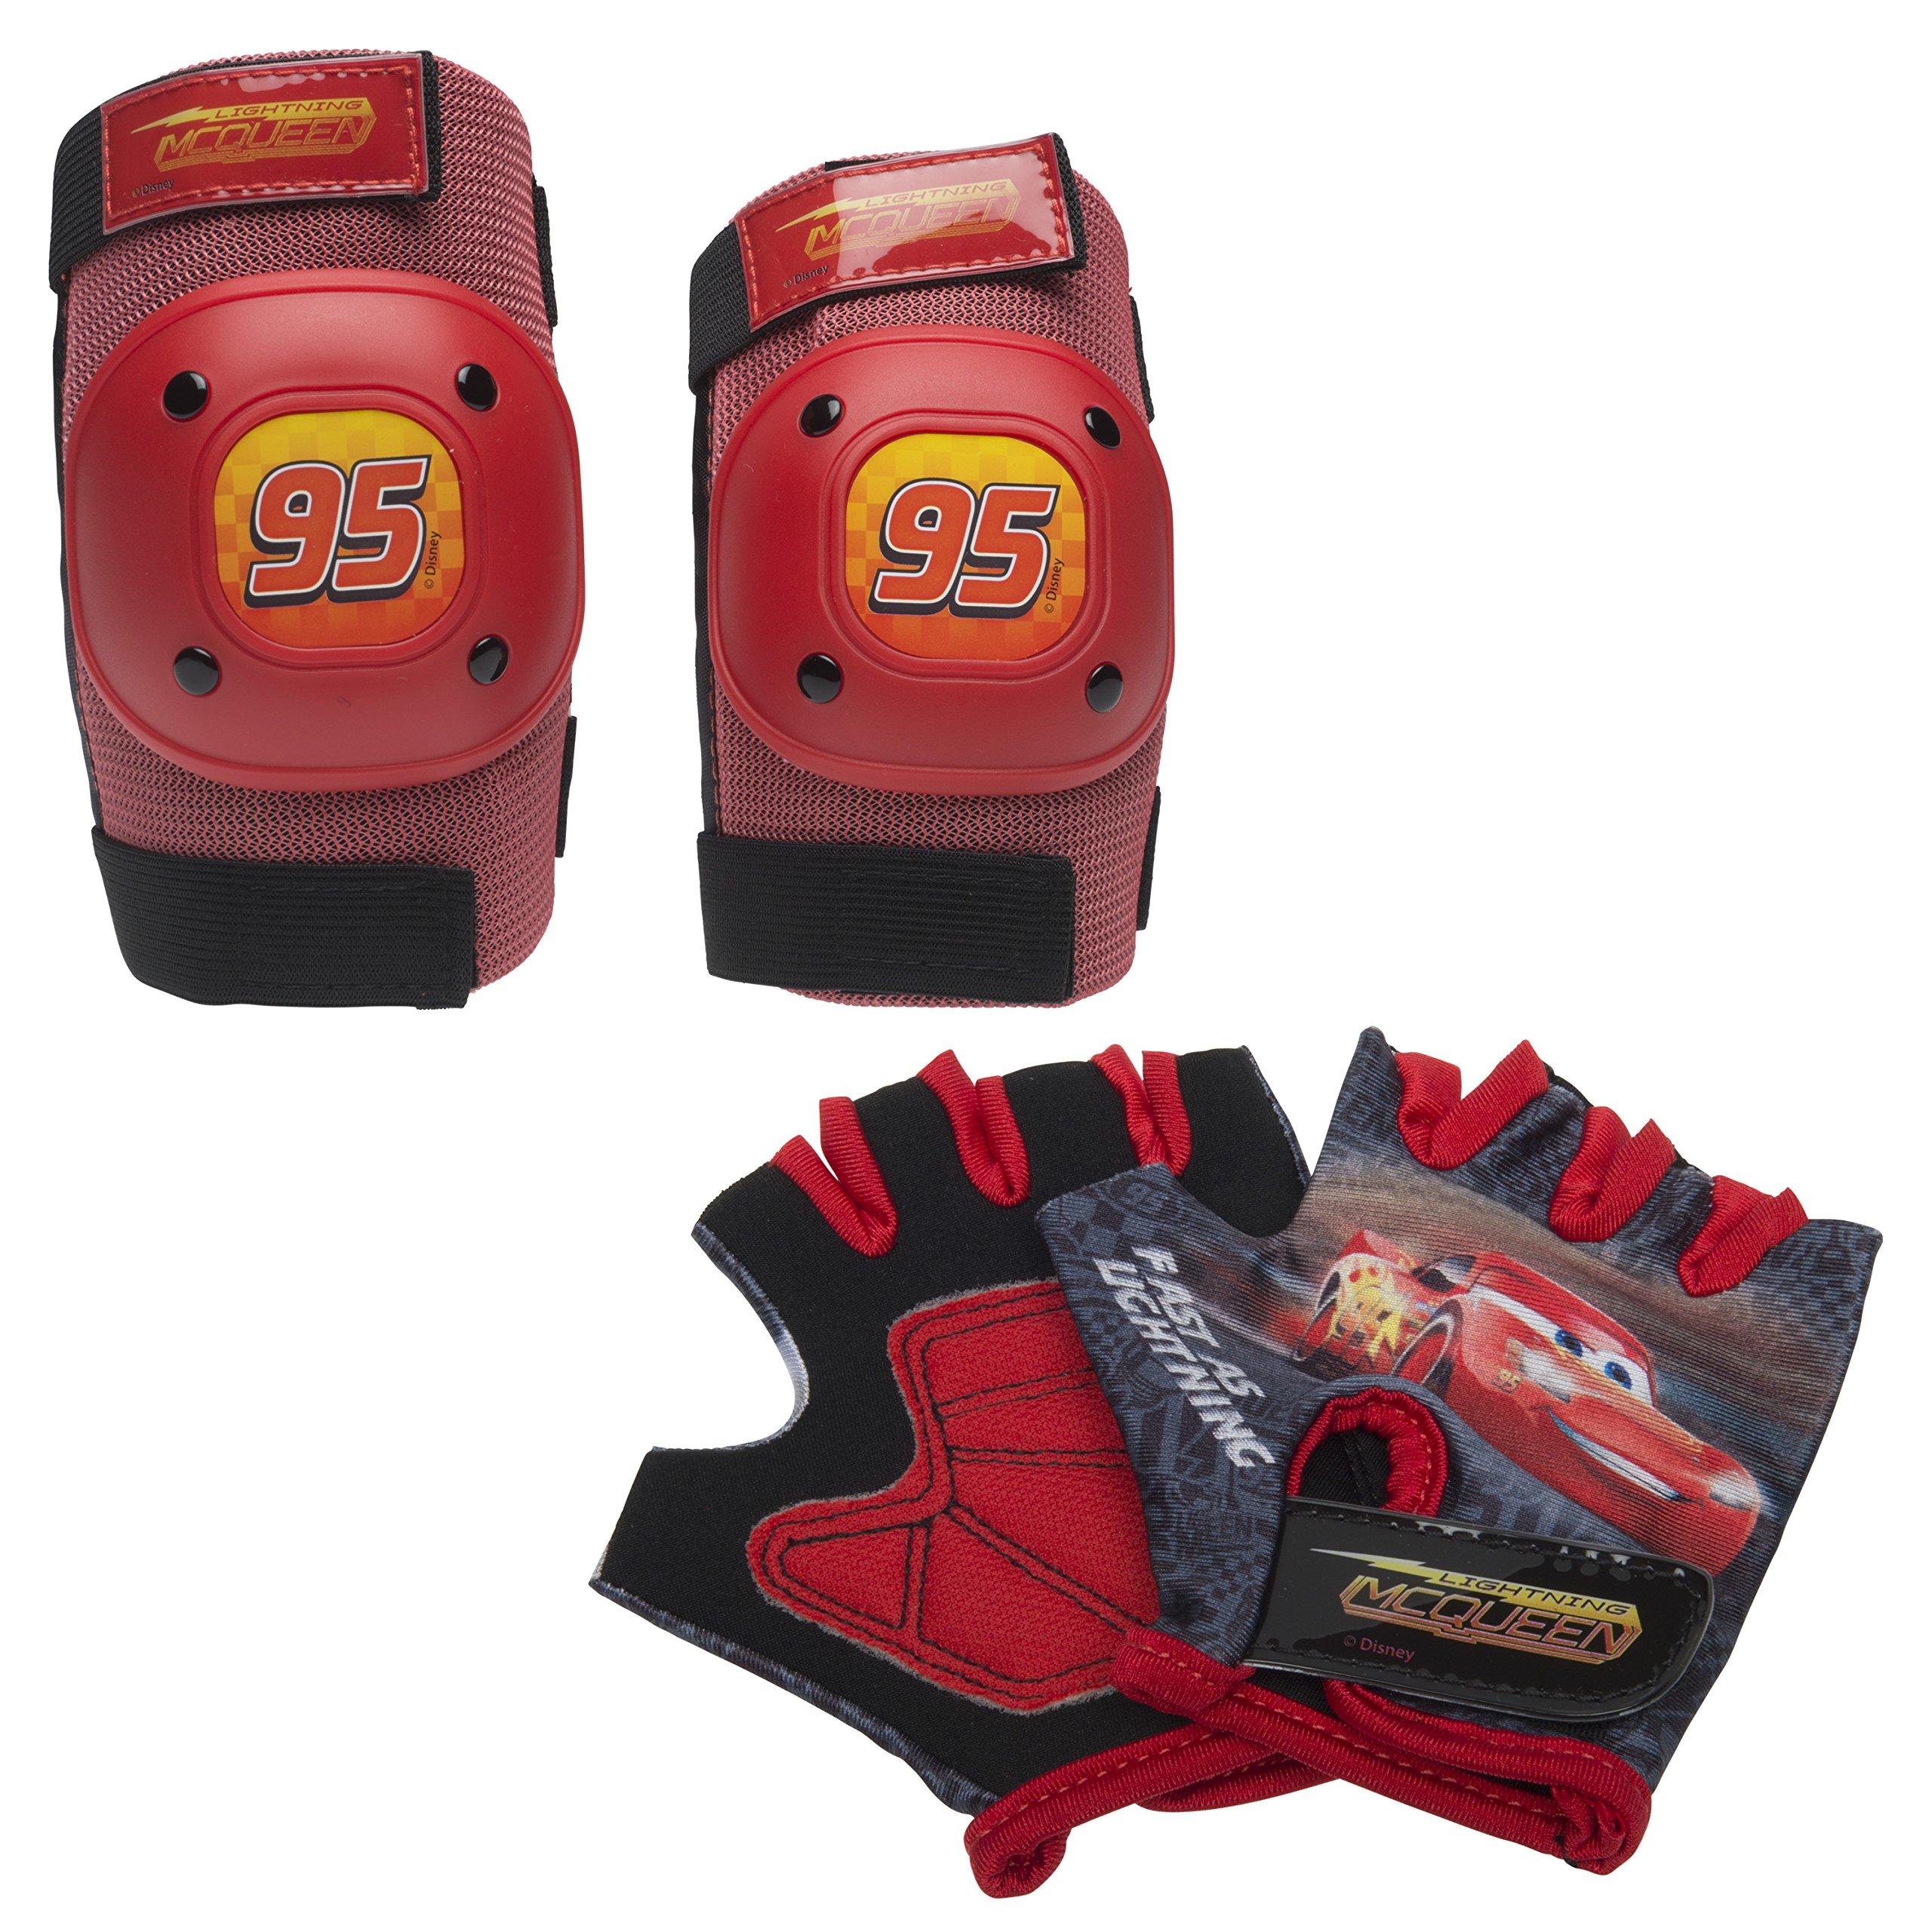 Bell Cars Pad & Glove Set